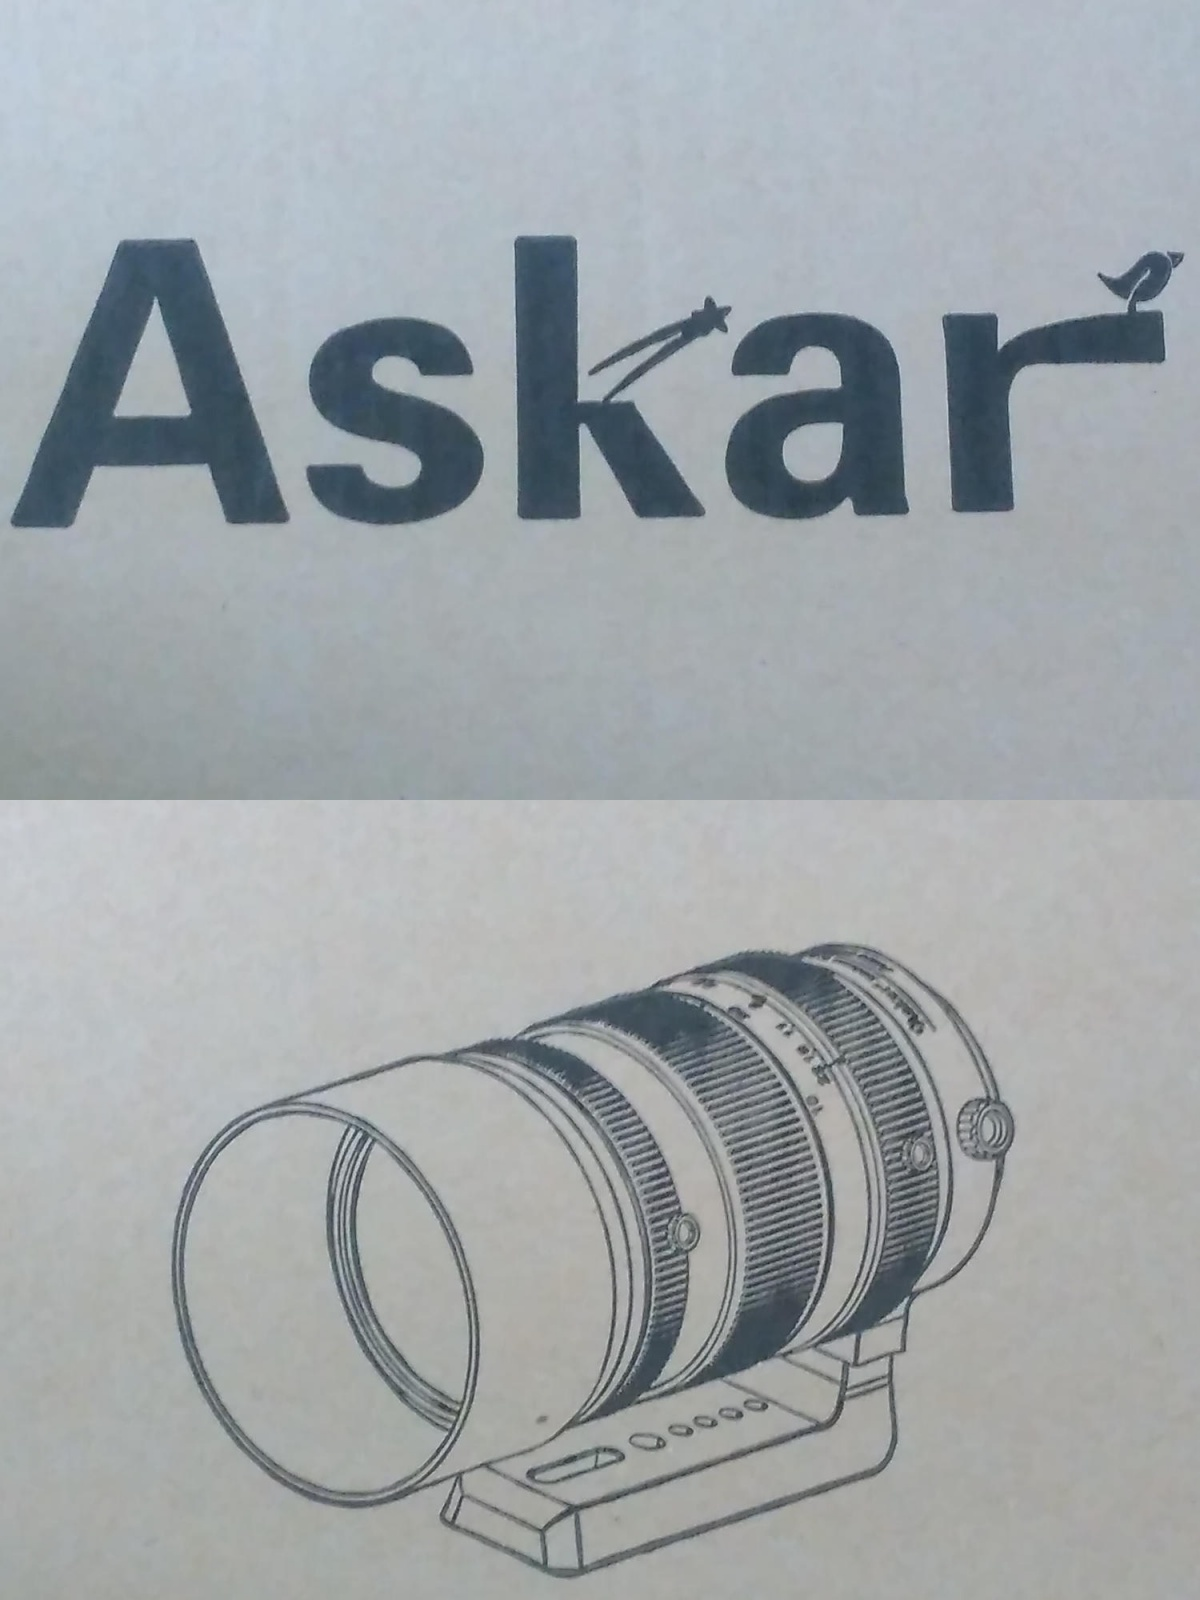 Askar_ACL200_F4_Pudelko.jpg